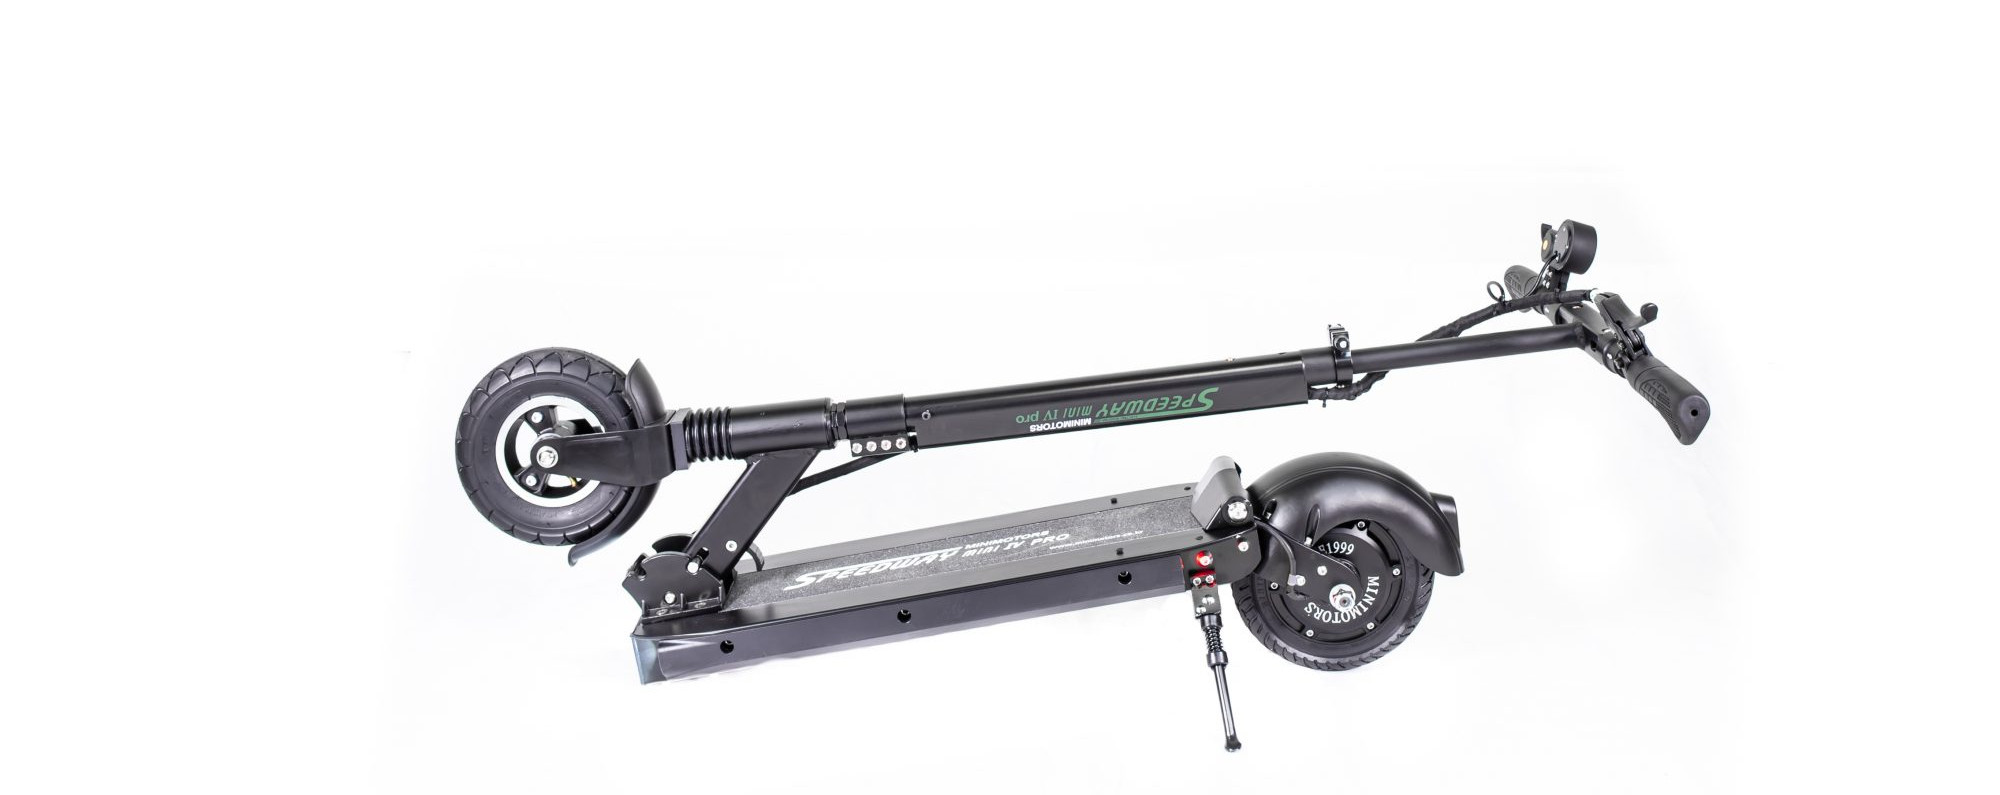 MG 4713-2000x1200-1